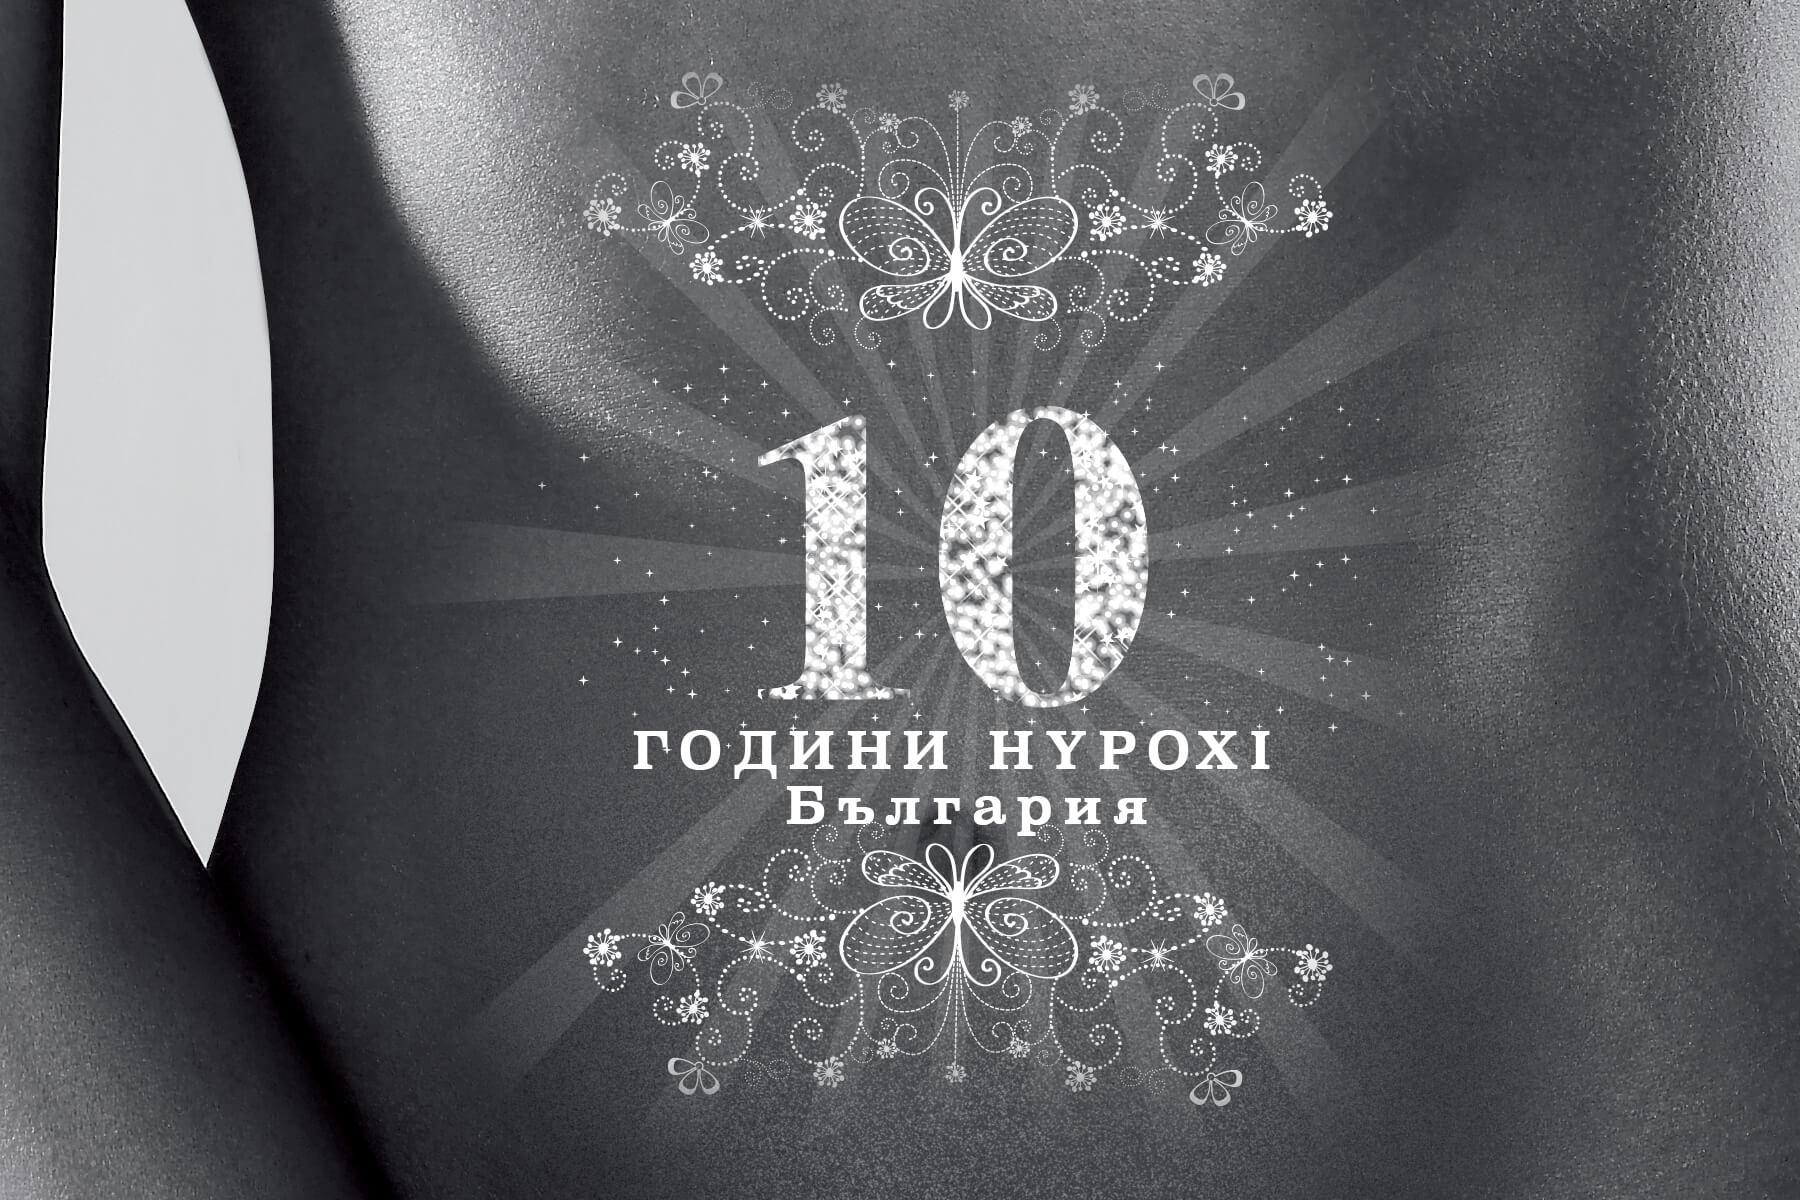 10 години HYPOXI България